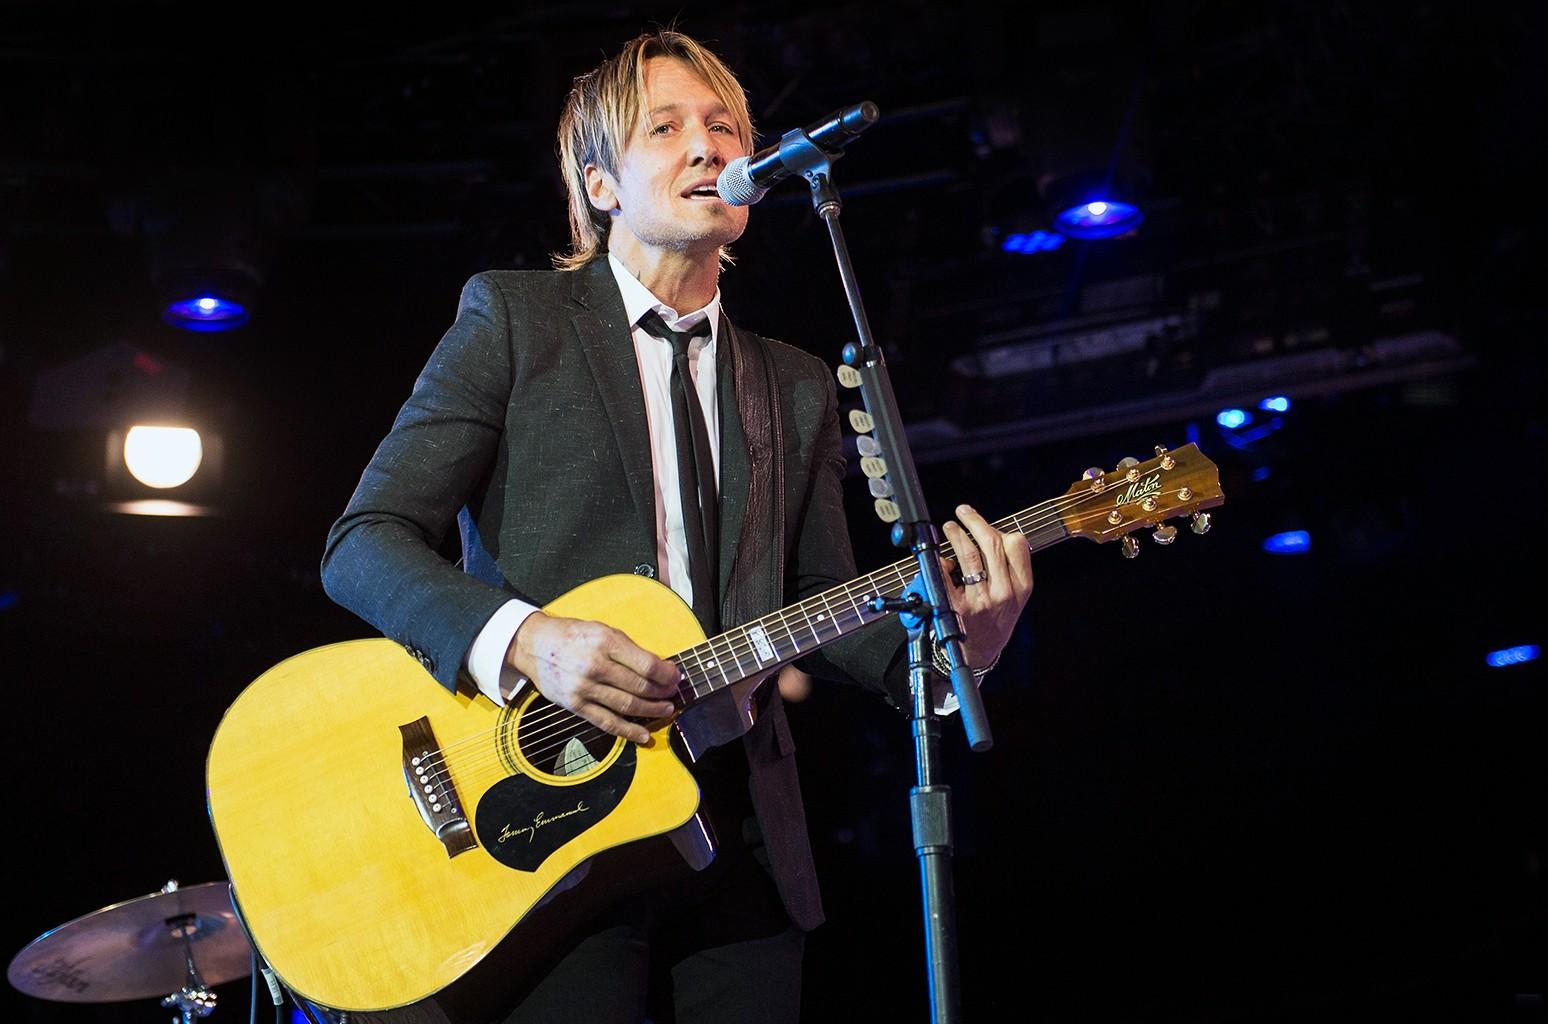 Keith Urban performs in Nashville, Tenn.